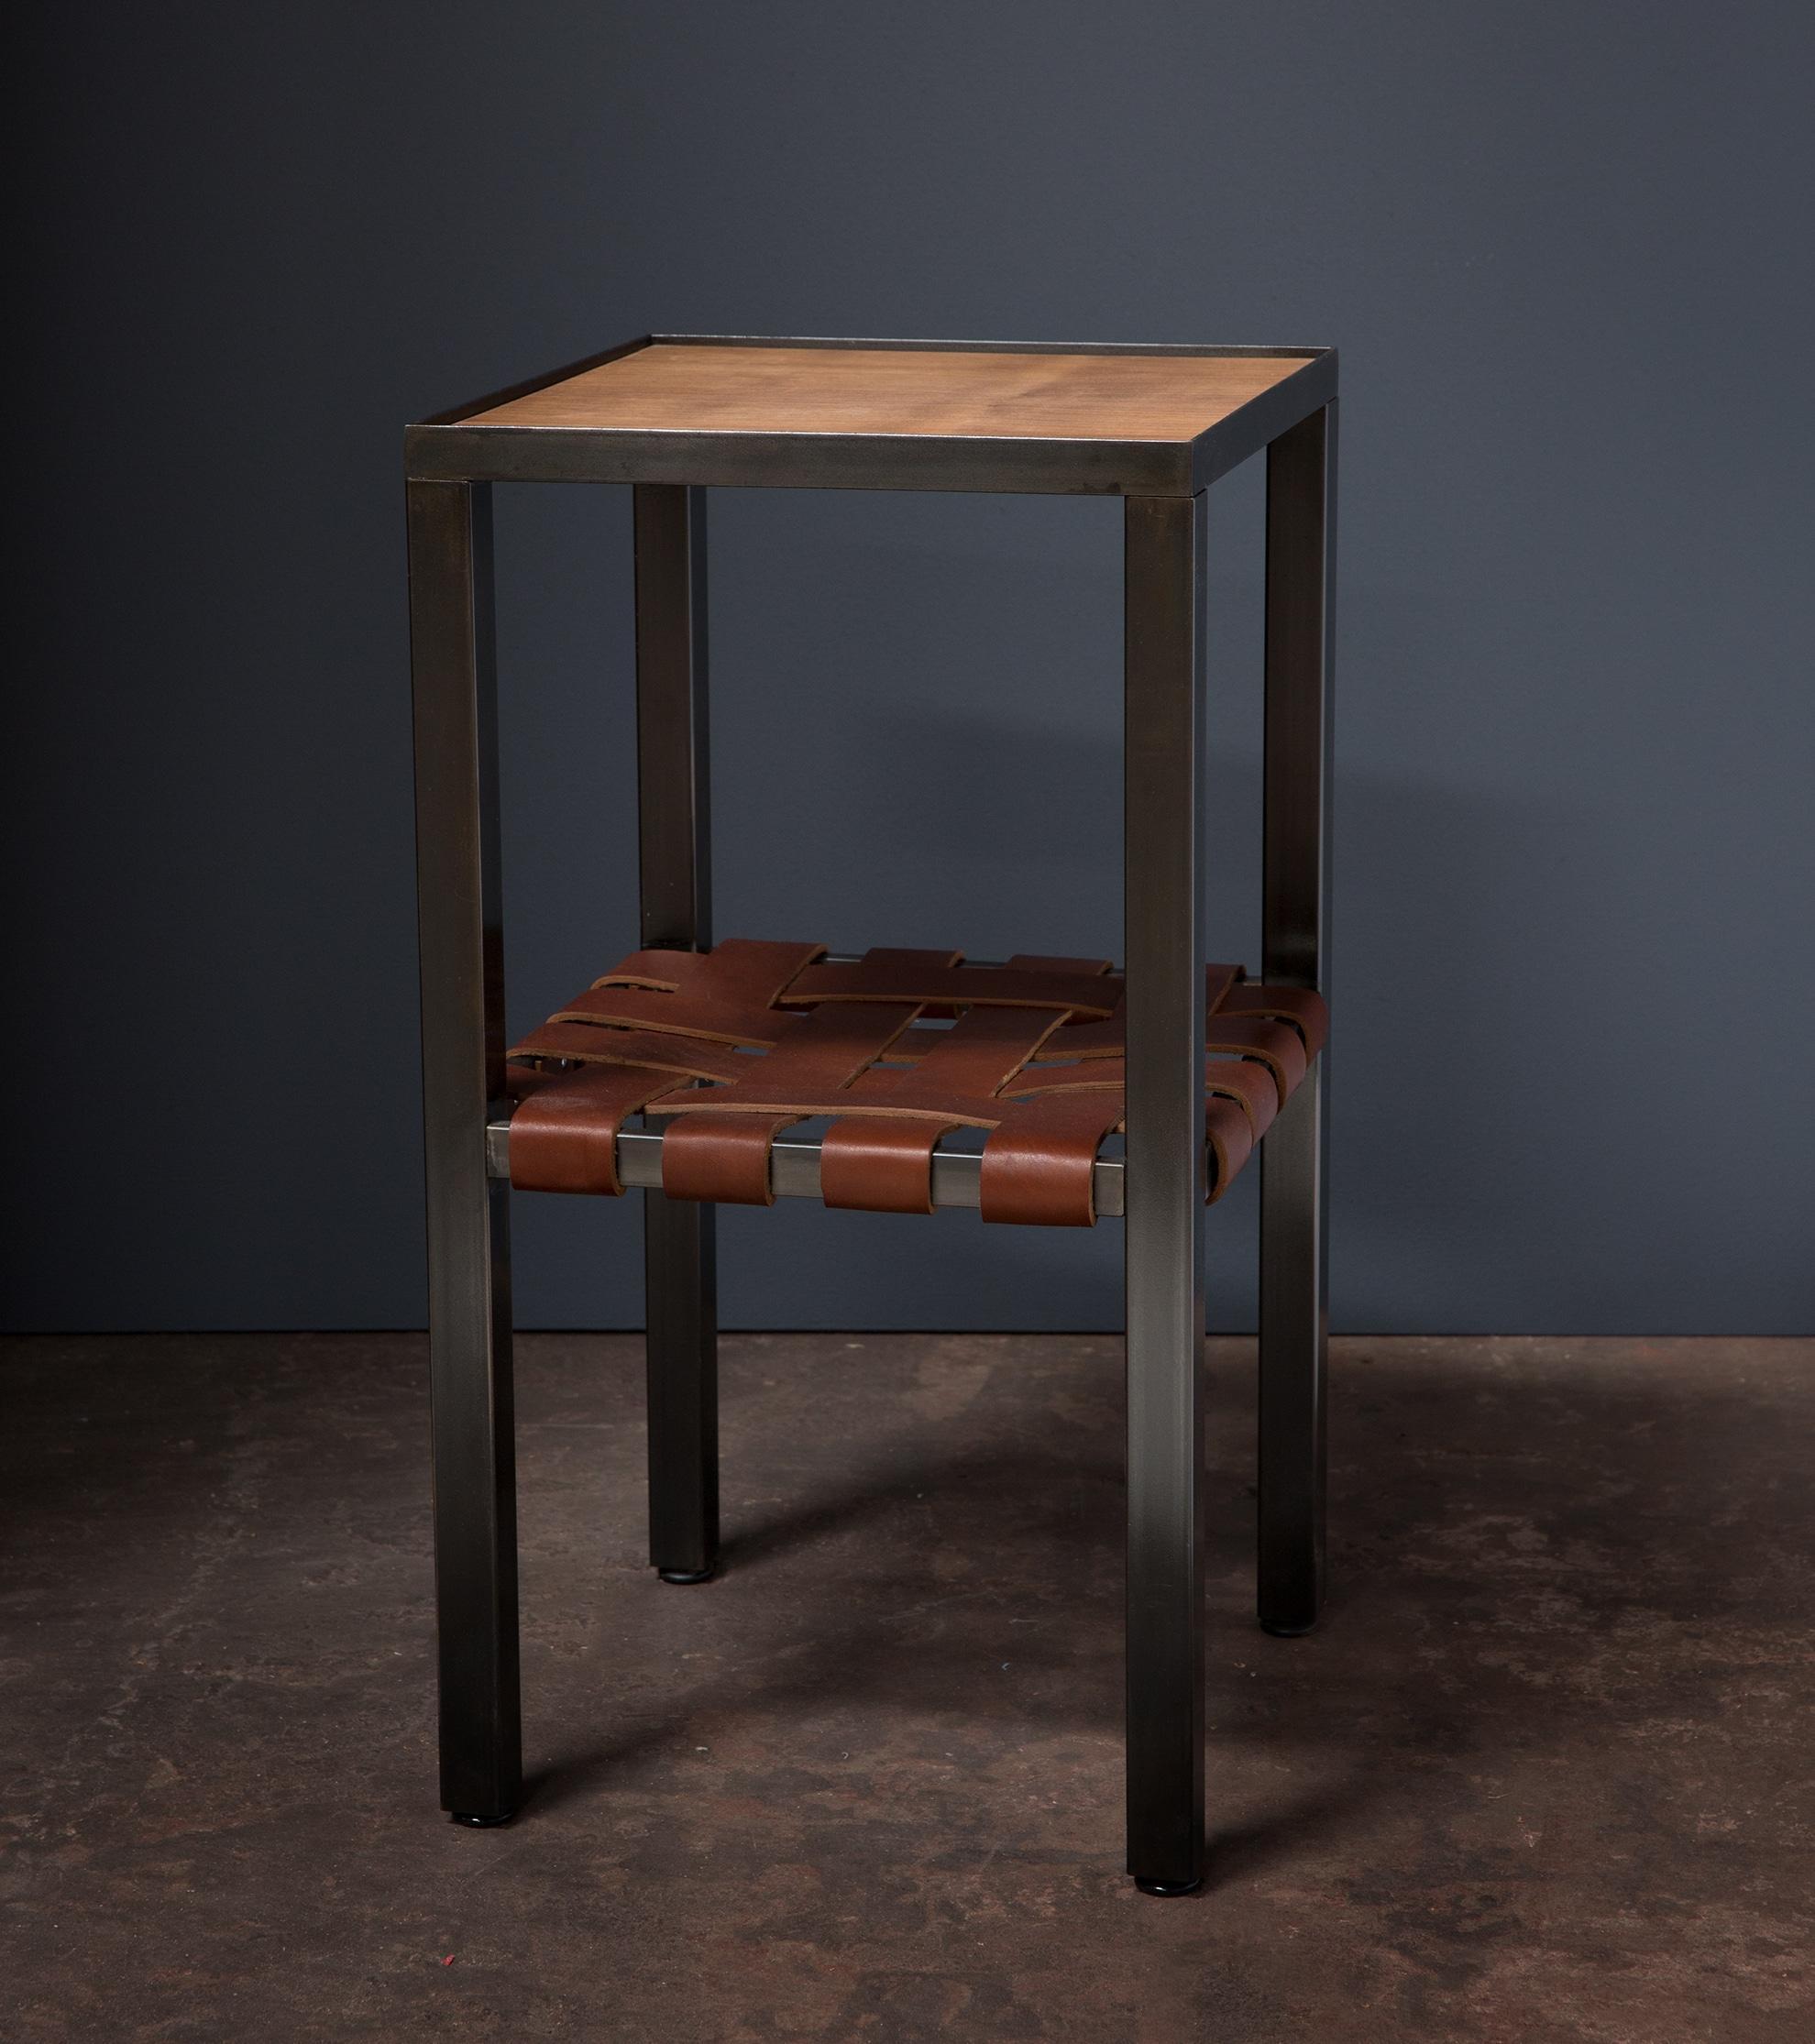 leather and steel nightstand, desk, wood, metalwork, metal work, metal fabrication, bay area metalworker